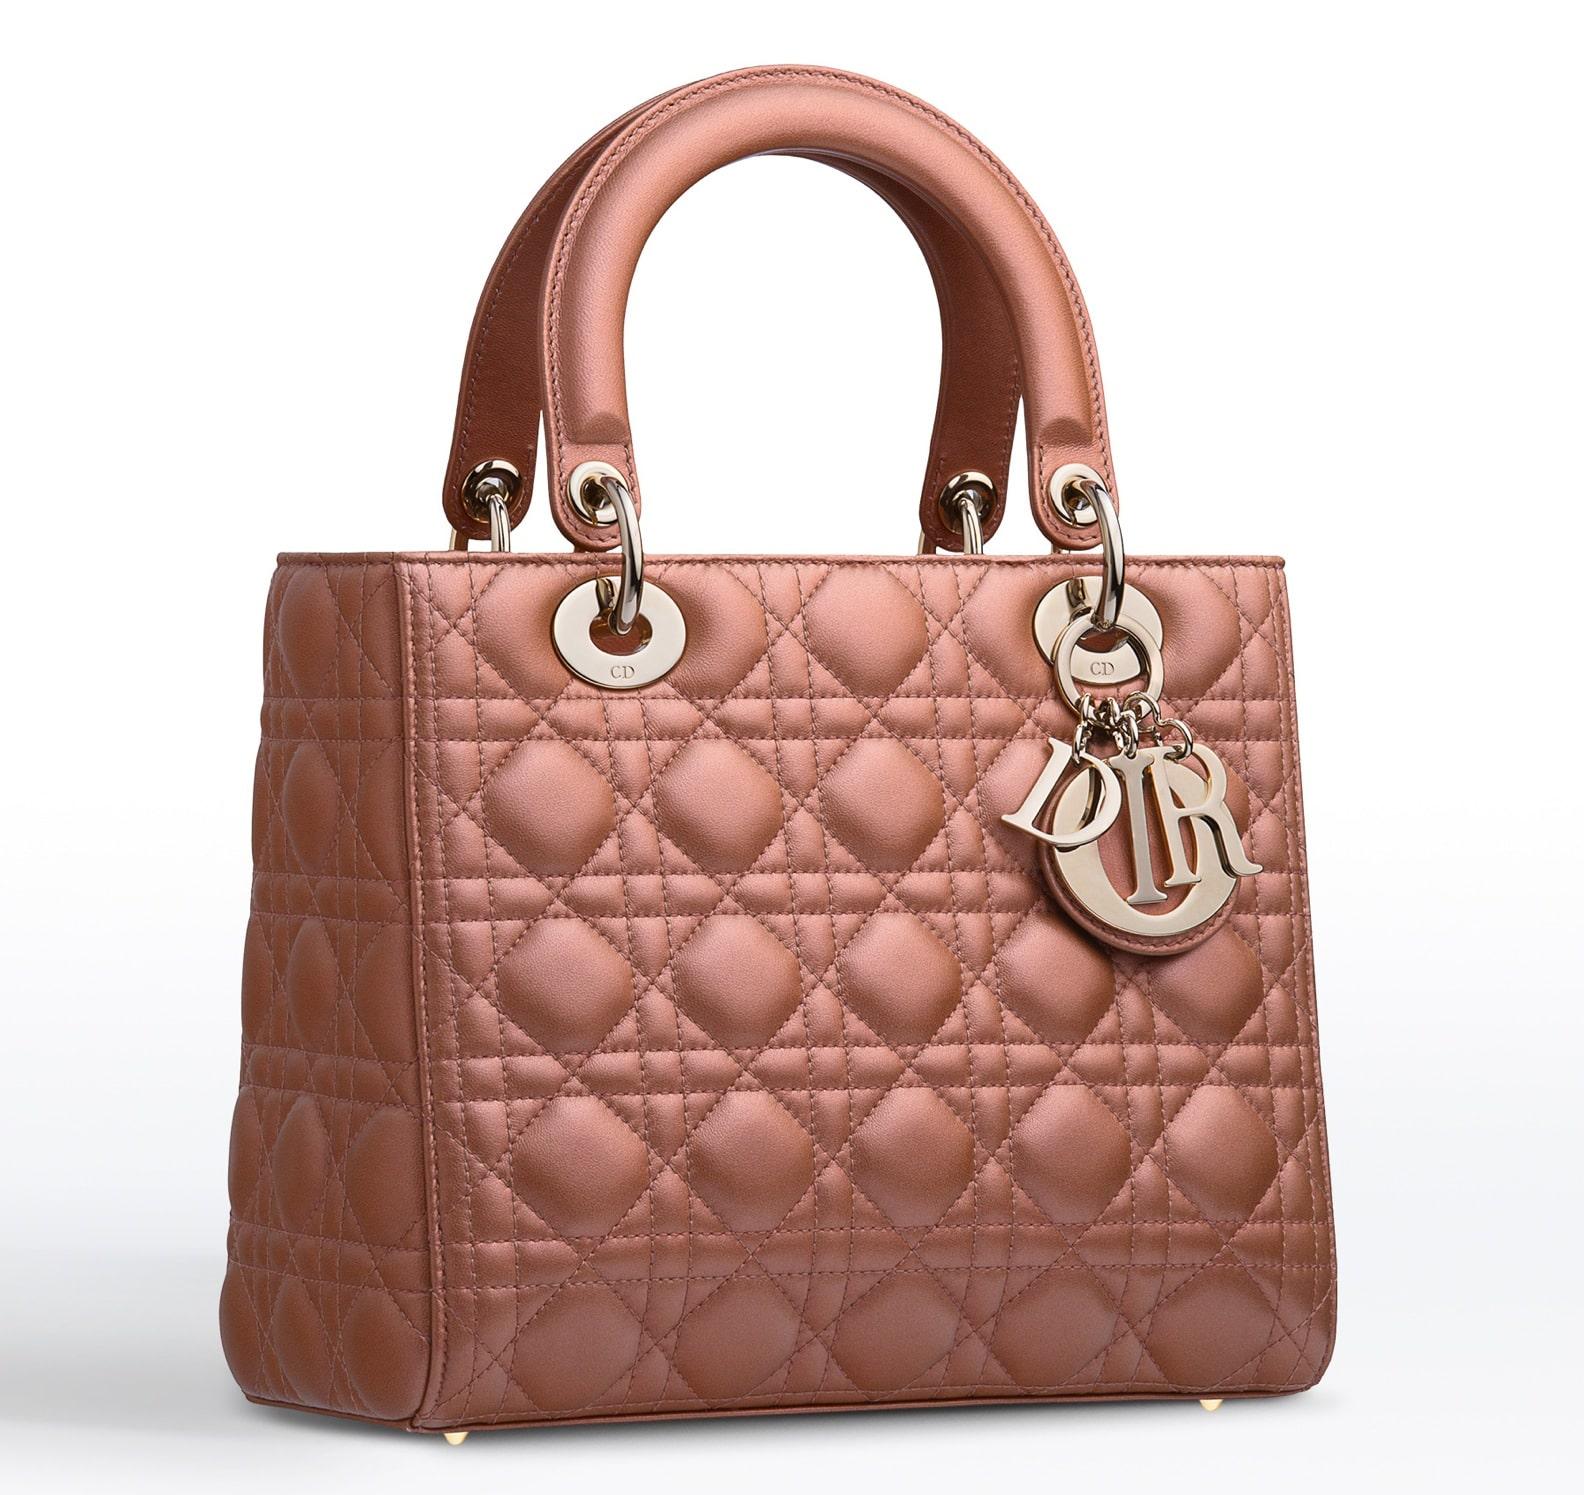 lady dior bag price - photo #39